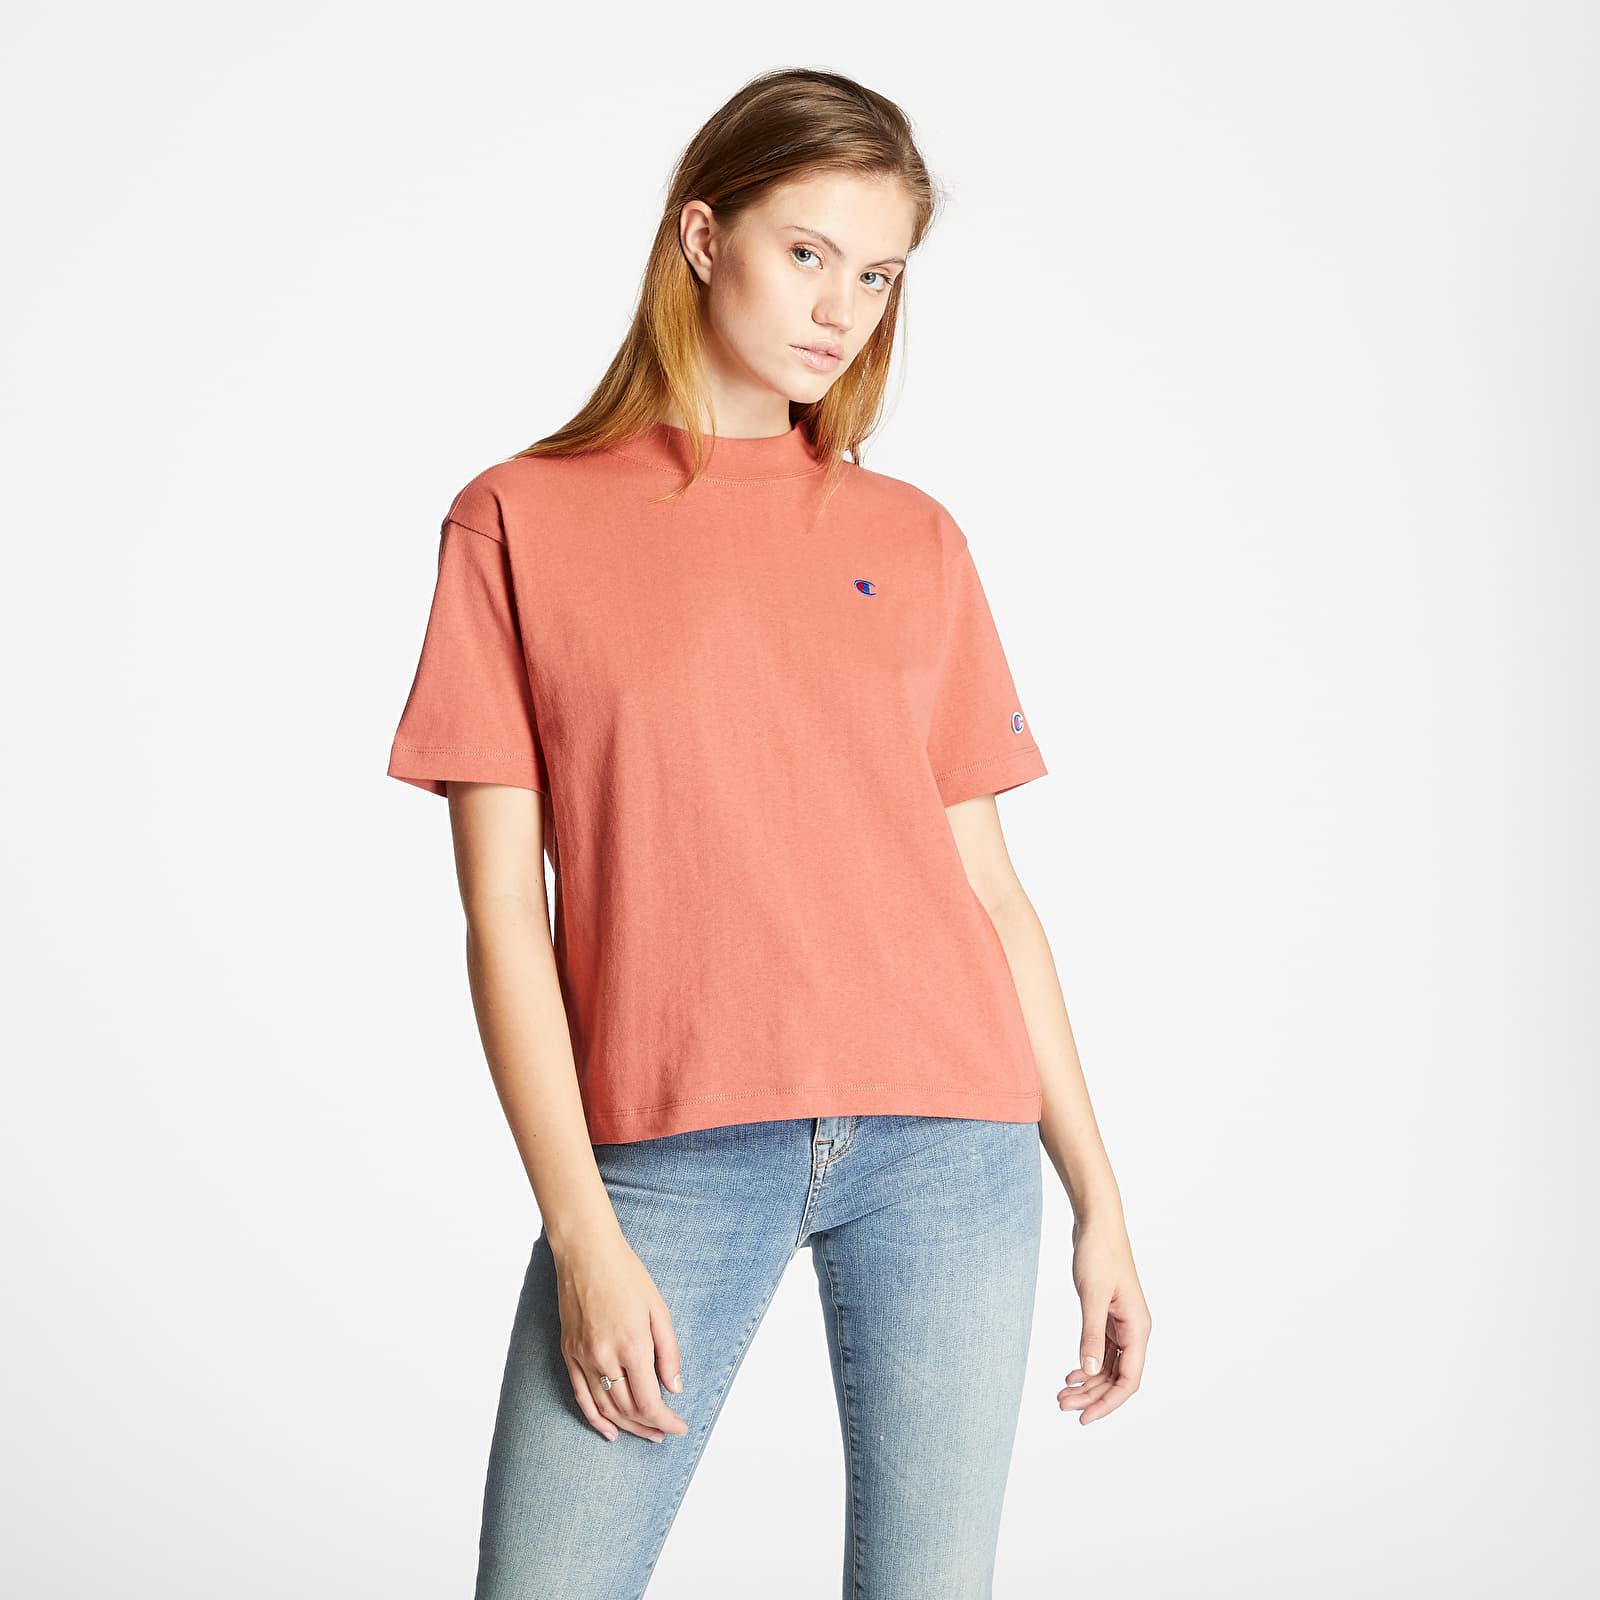 T-shirts Champion Tee Orange